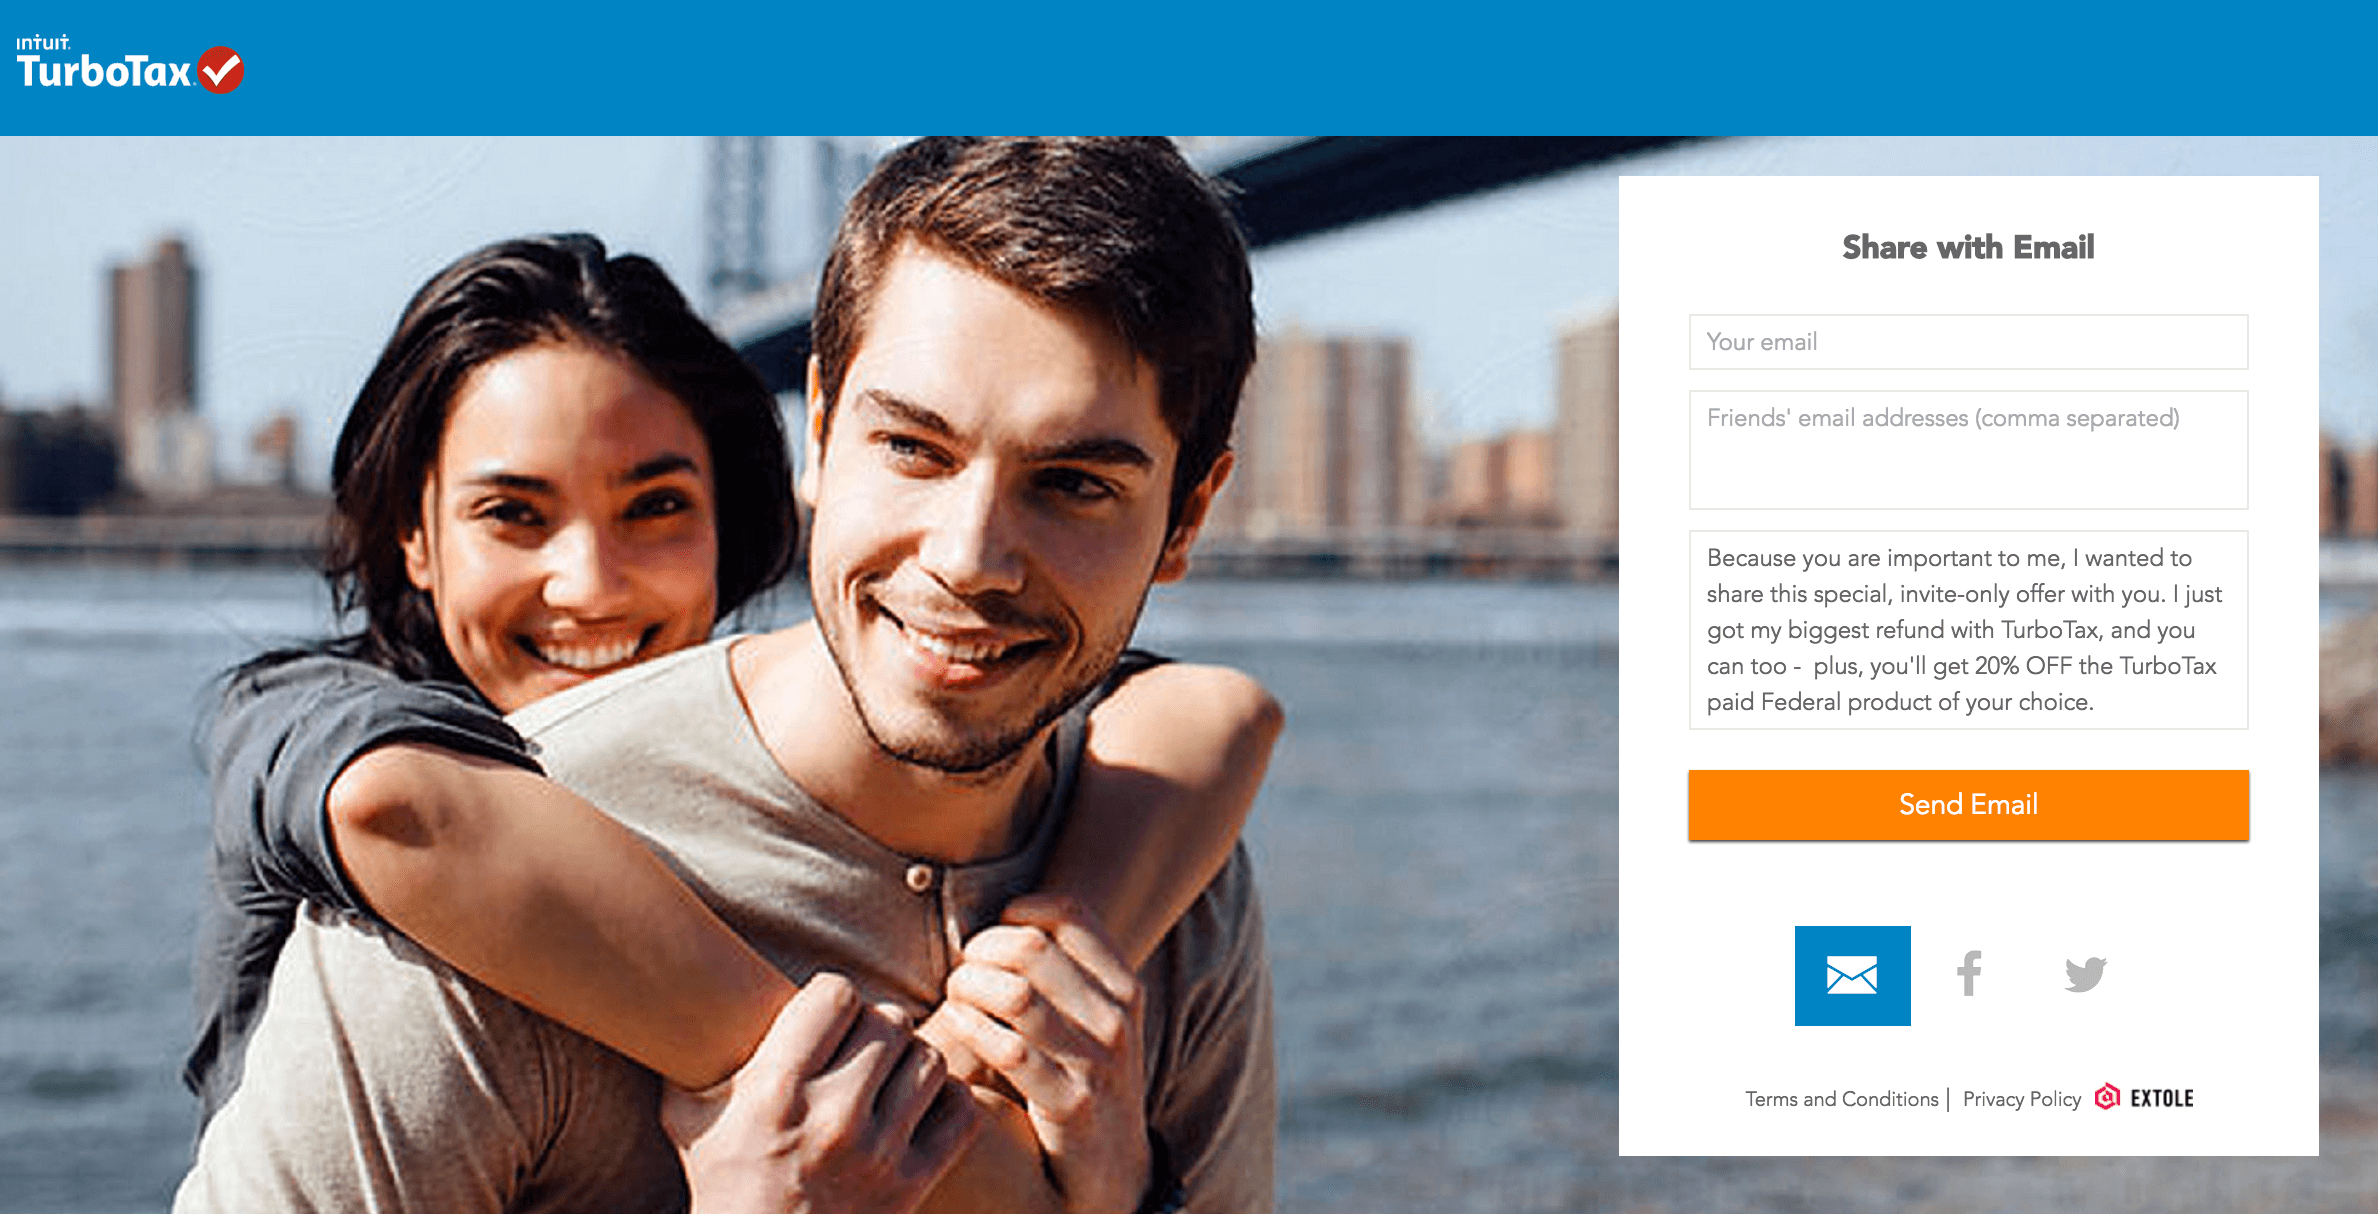 turbotax refer a friend offer 2017